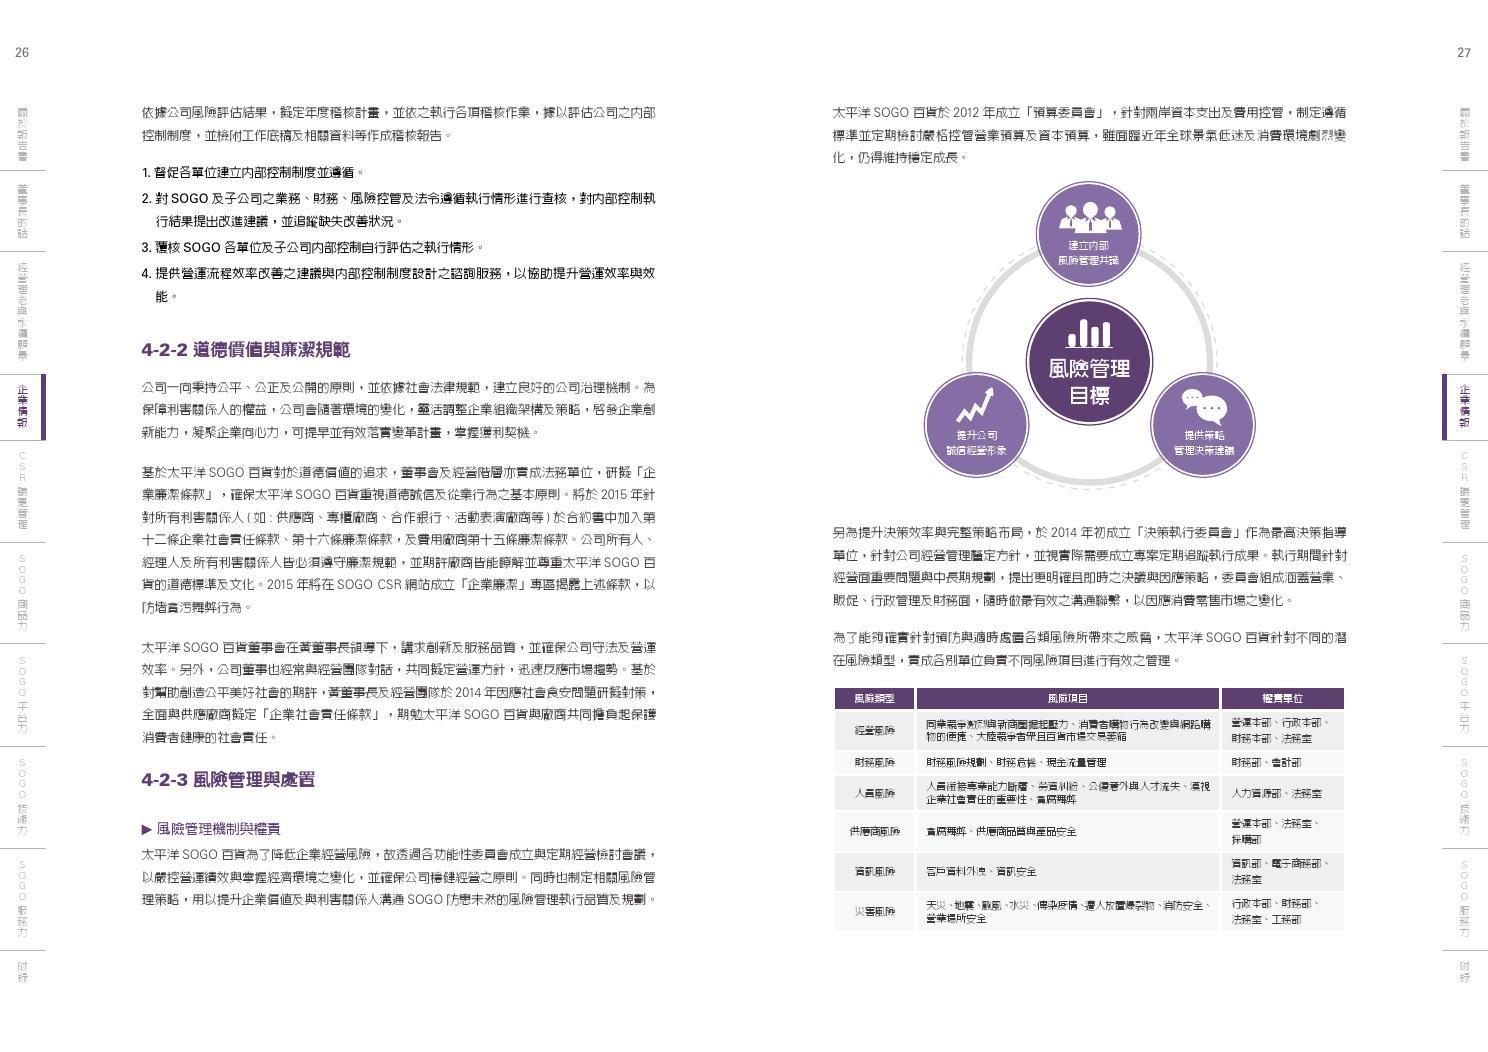 太平洋SOGO百貨2014年企業永續報告書 by CSRone Reporting - Issuu